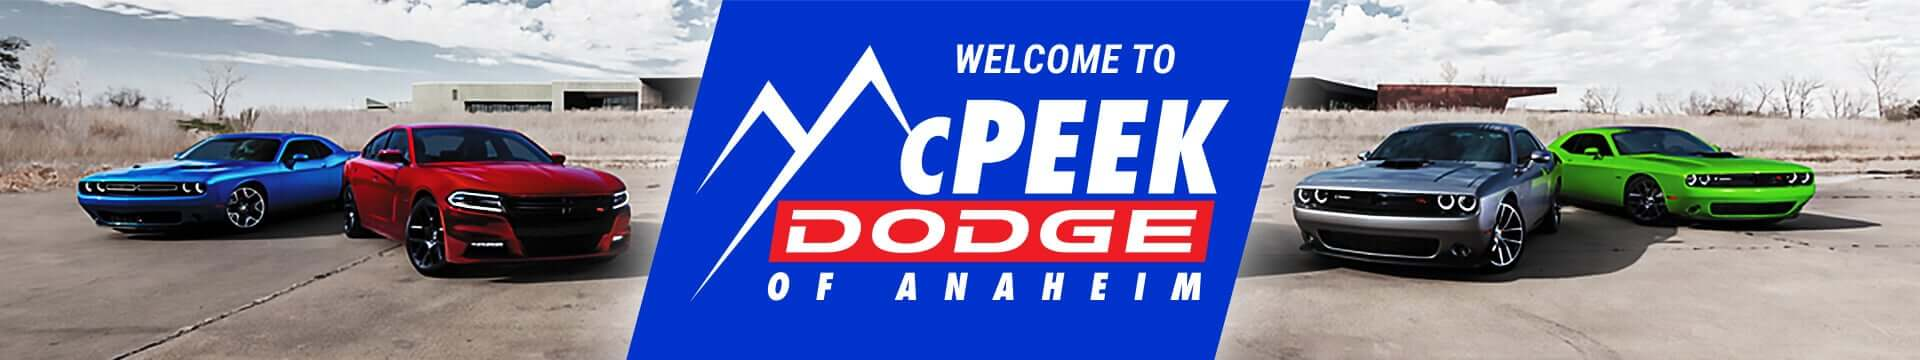 McPeek Dodge of Anaheim